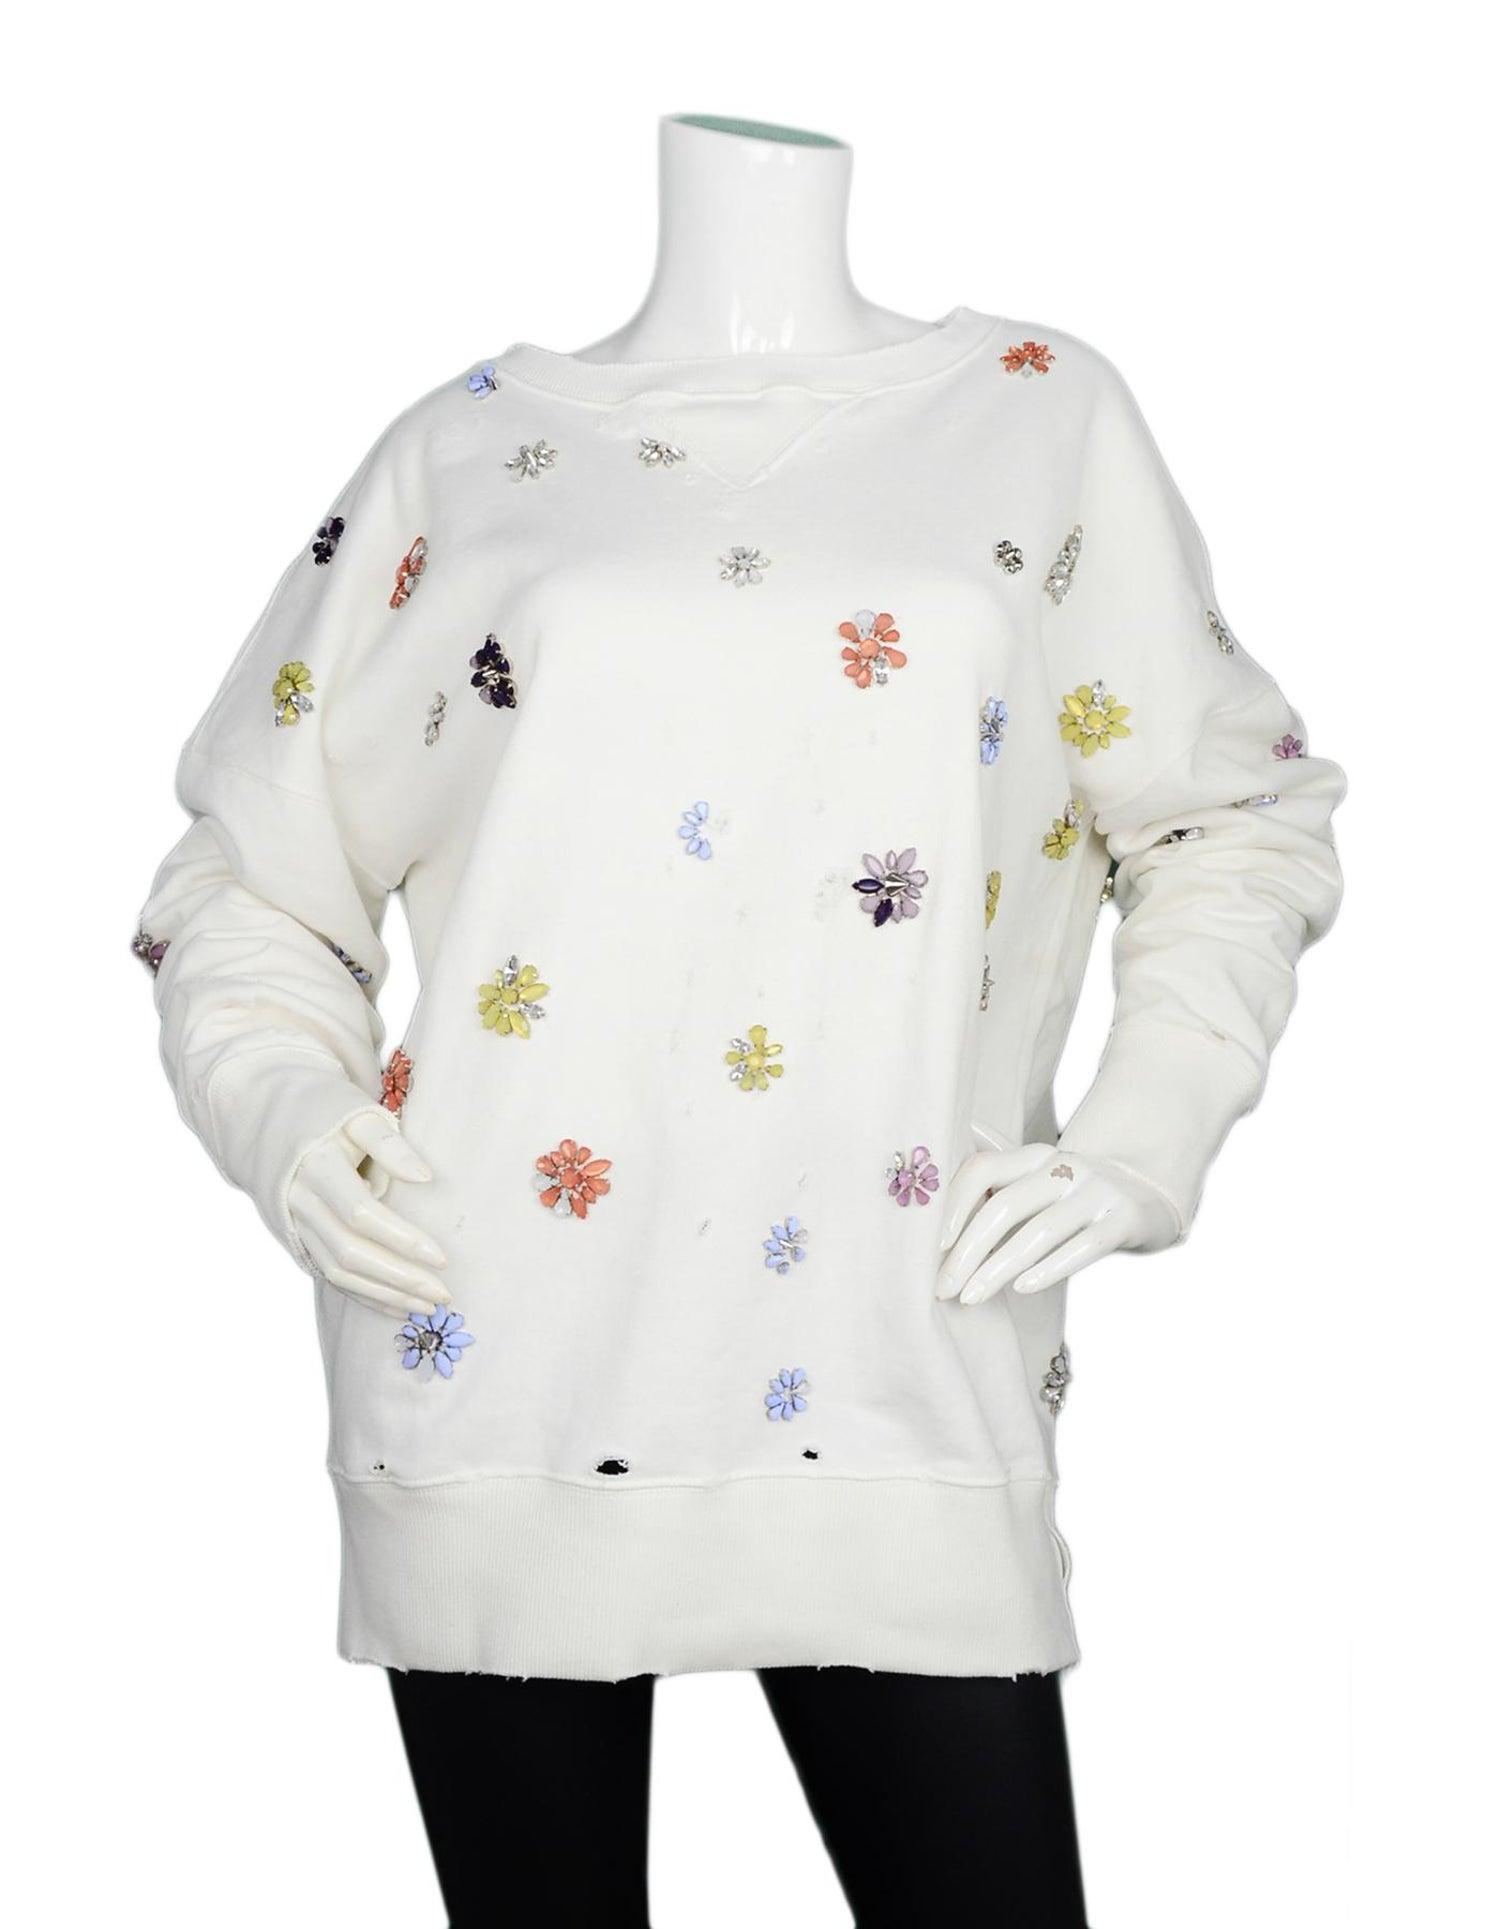 e1cef8083f2 Faith Connexion White Distressed Cotton Sweatshirt W  Jewel Embellishment  Sz L For Sale at 1stdibs